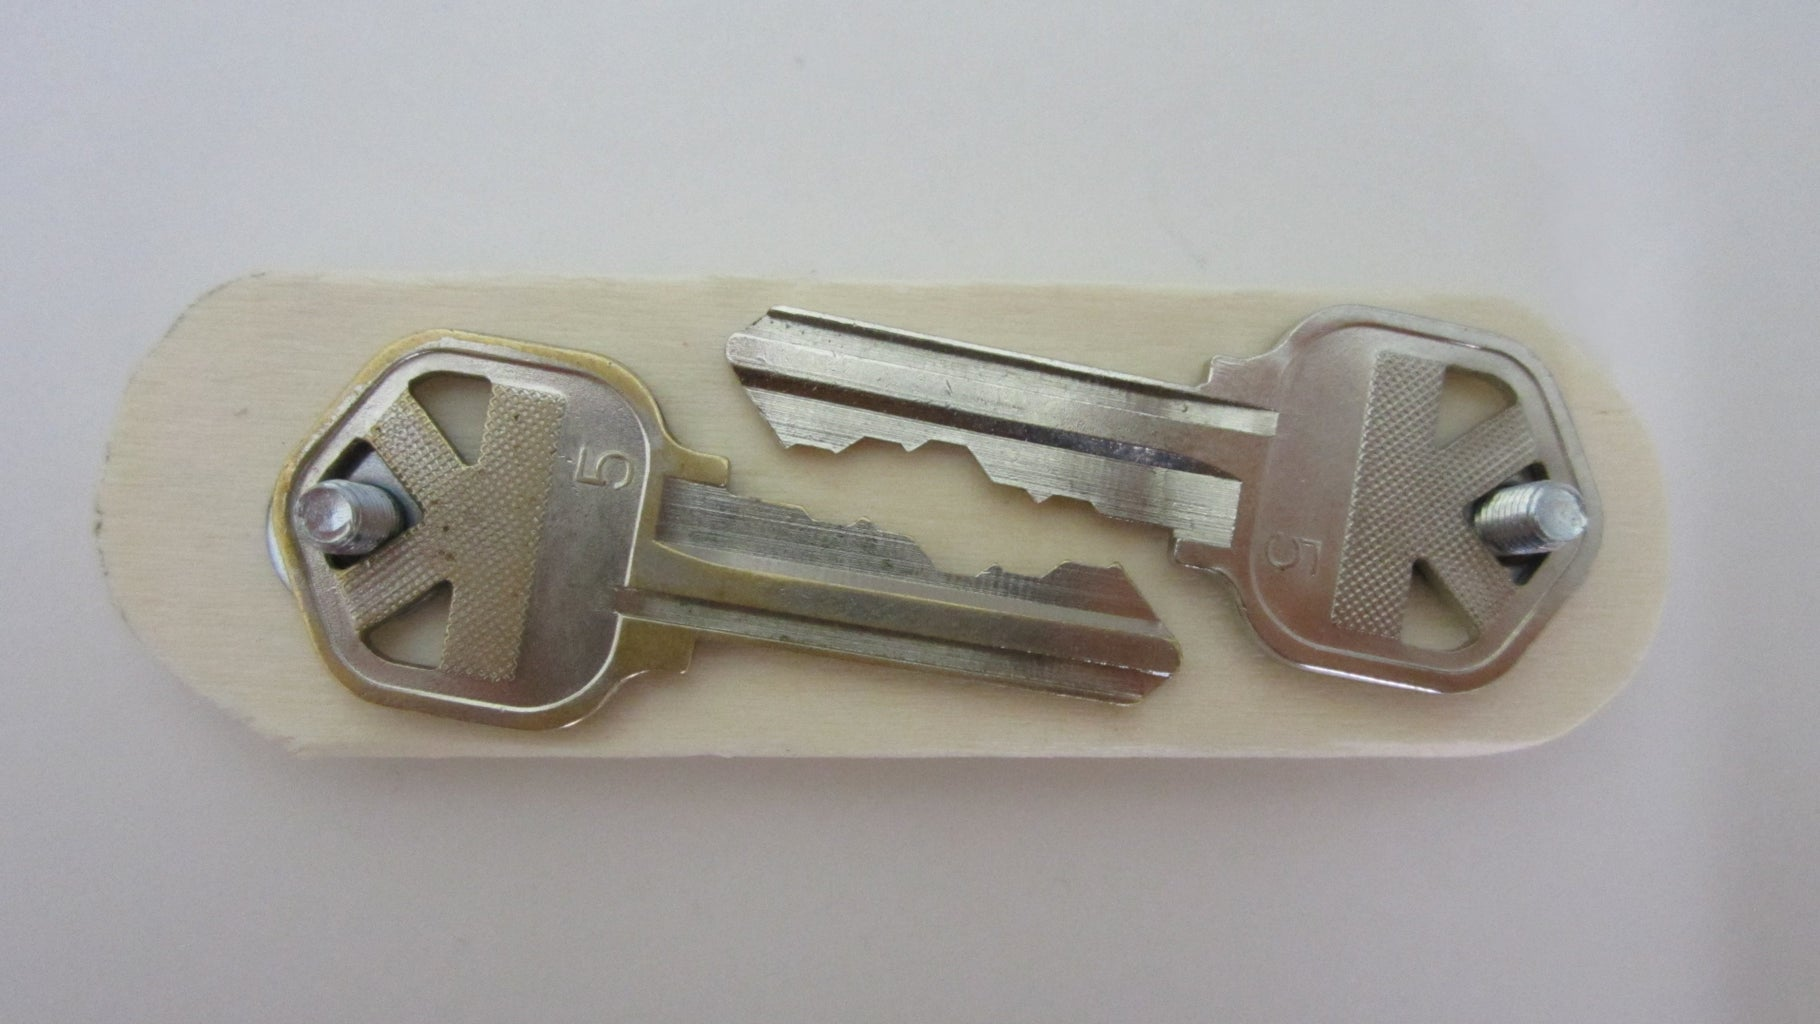 Swiss Army Key Ring